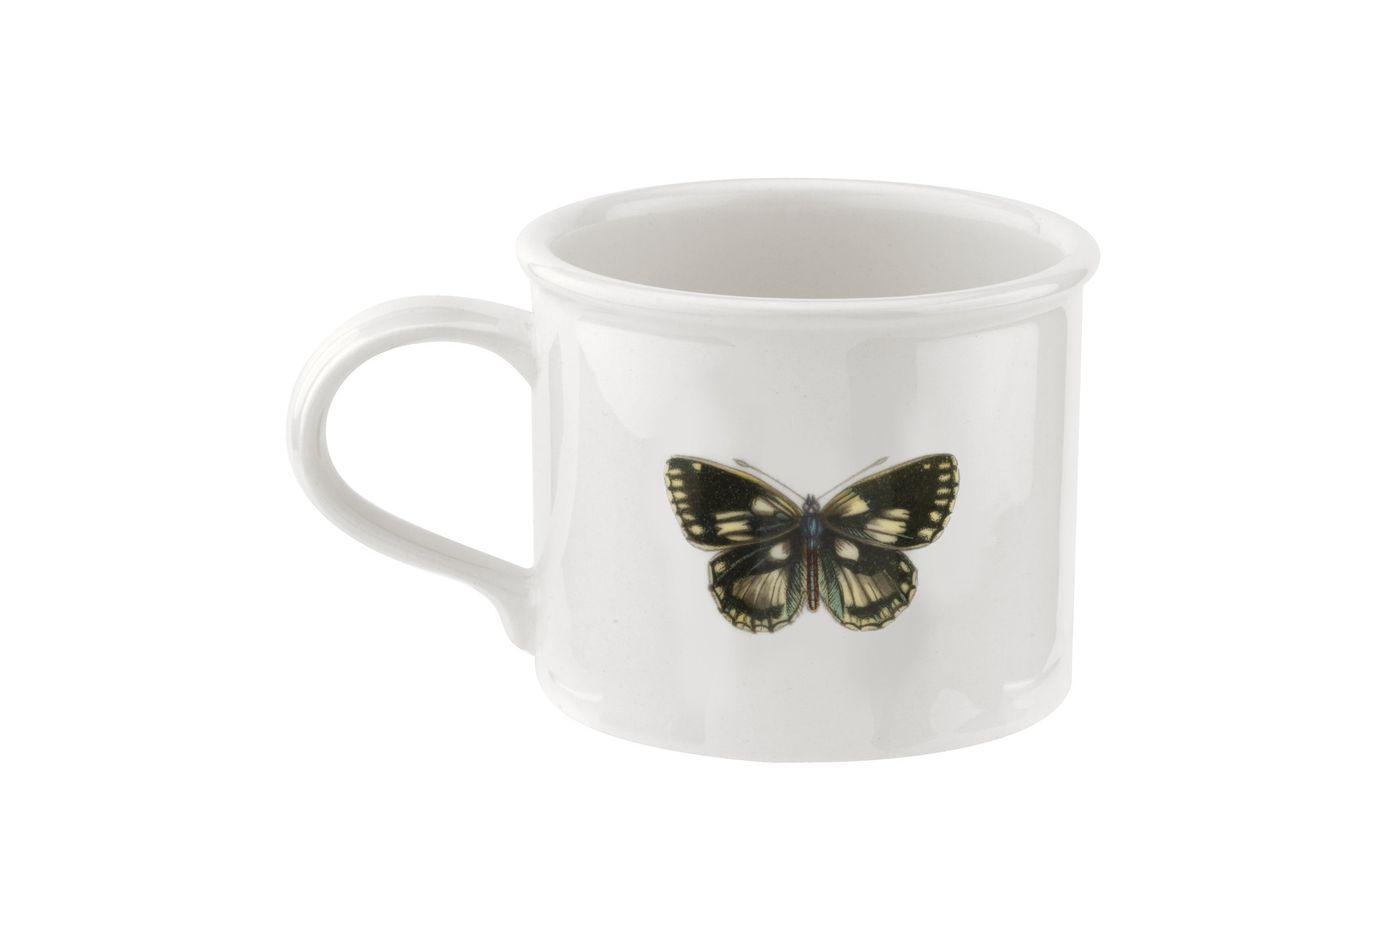 Portmeirion Botanic Garden Harmony Breakfast Cup & Saucer Moss Green 260ml thumb 2